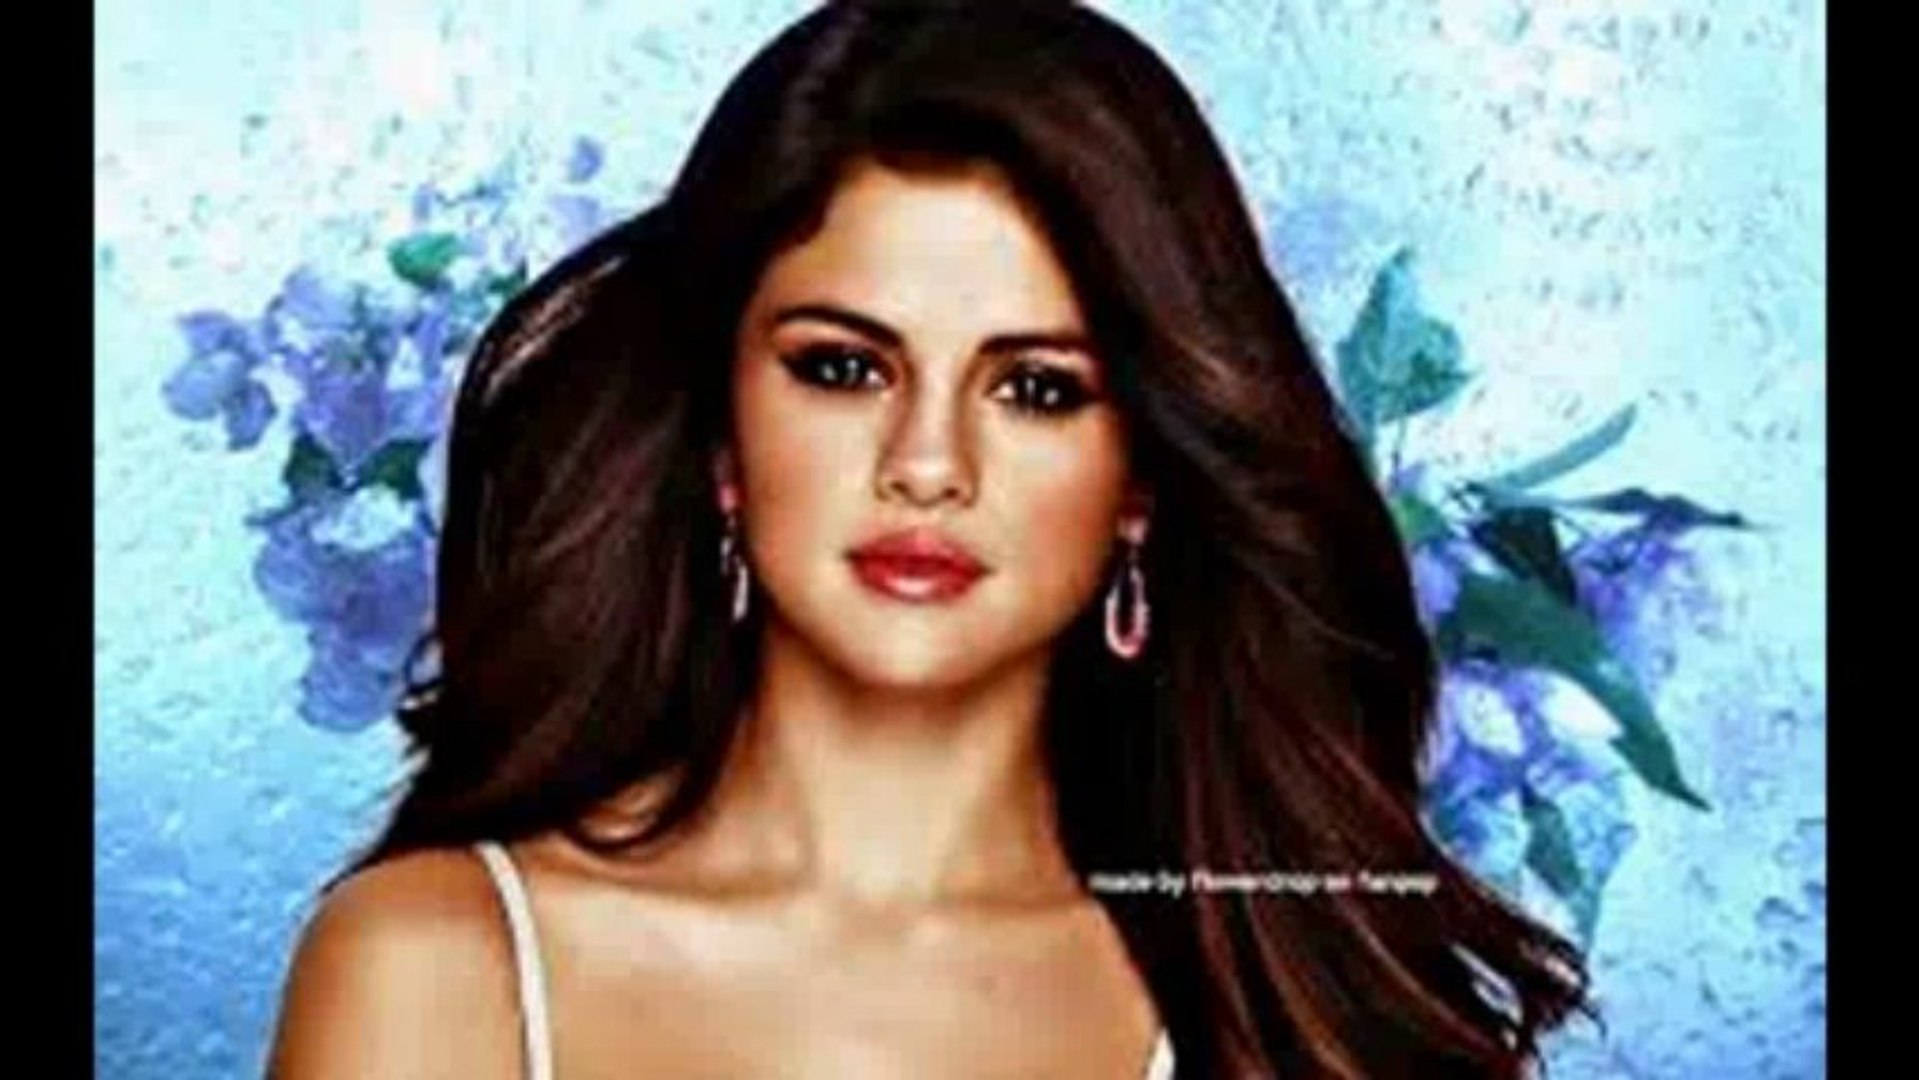 Selfao-Sexy Forever=Selena Gomez